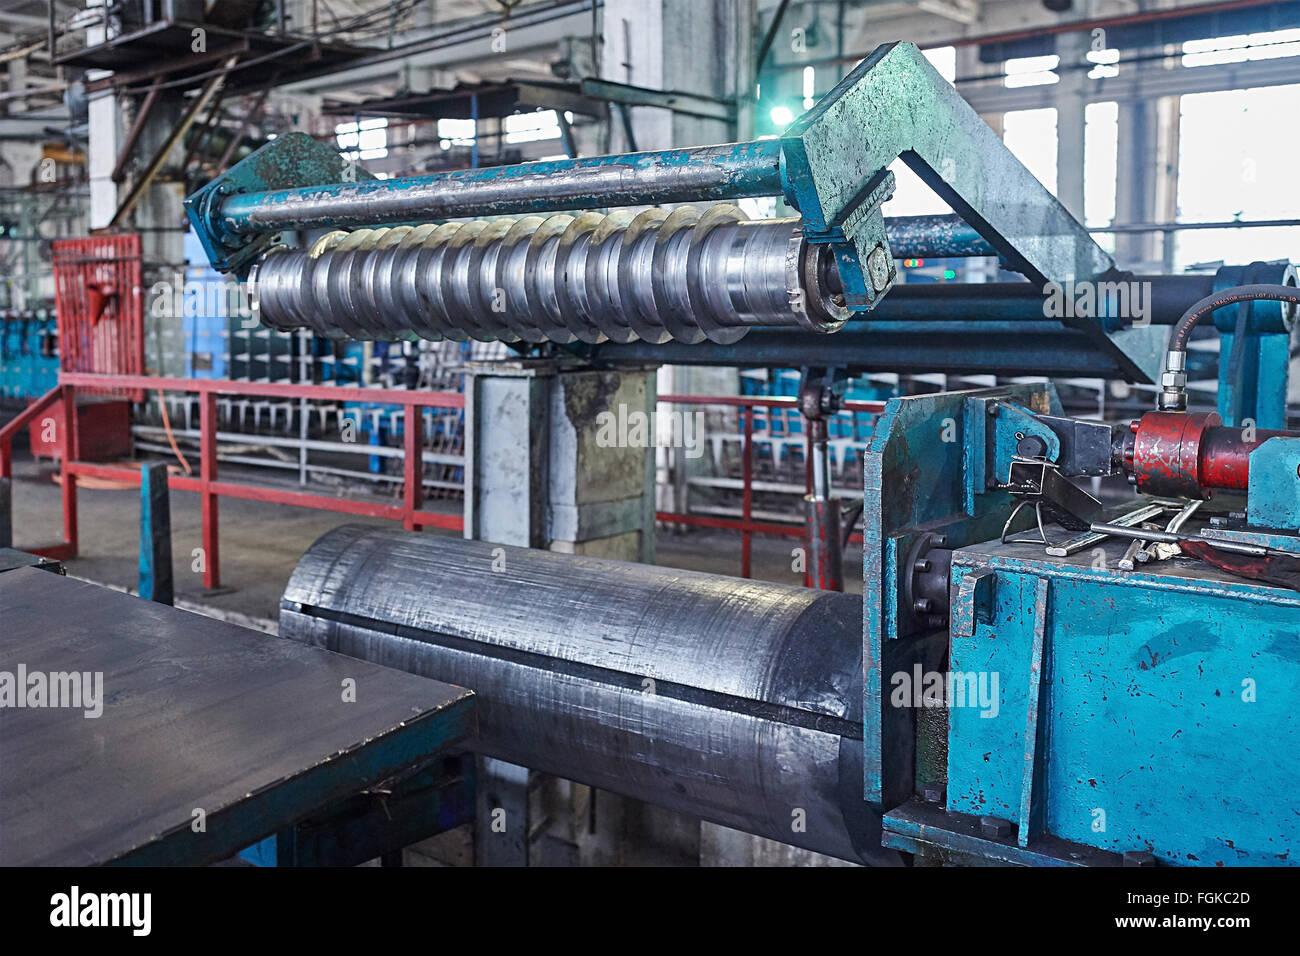 machine for slitting steel sheet - Stock Image